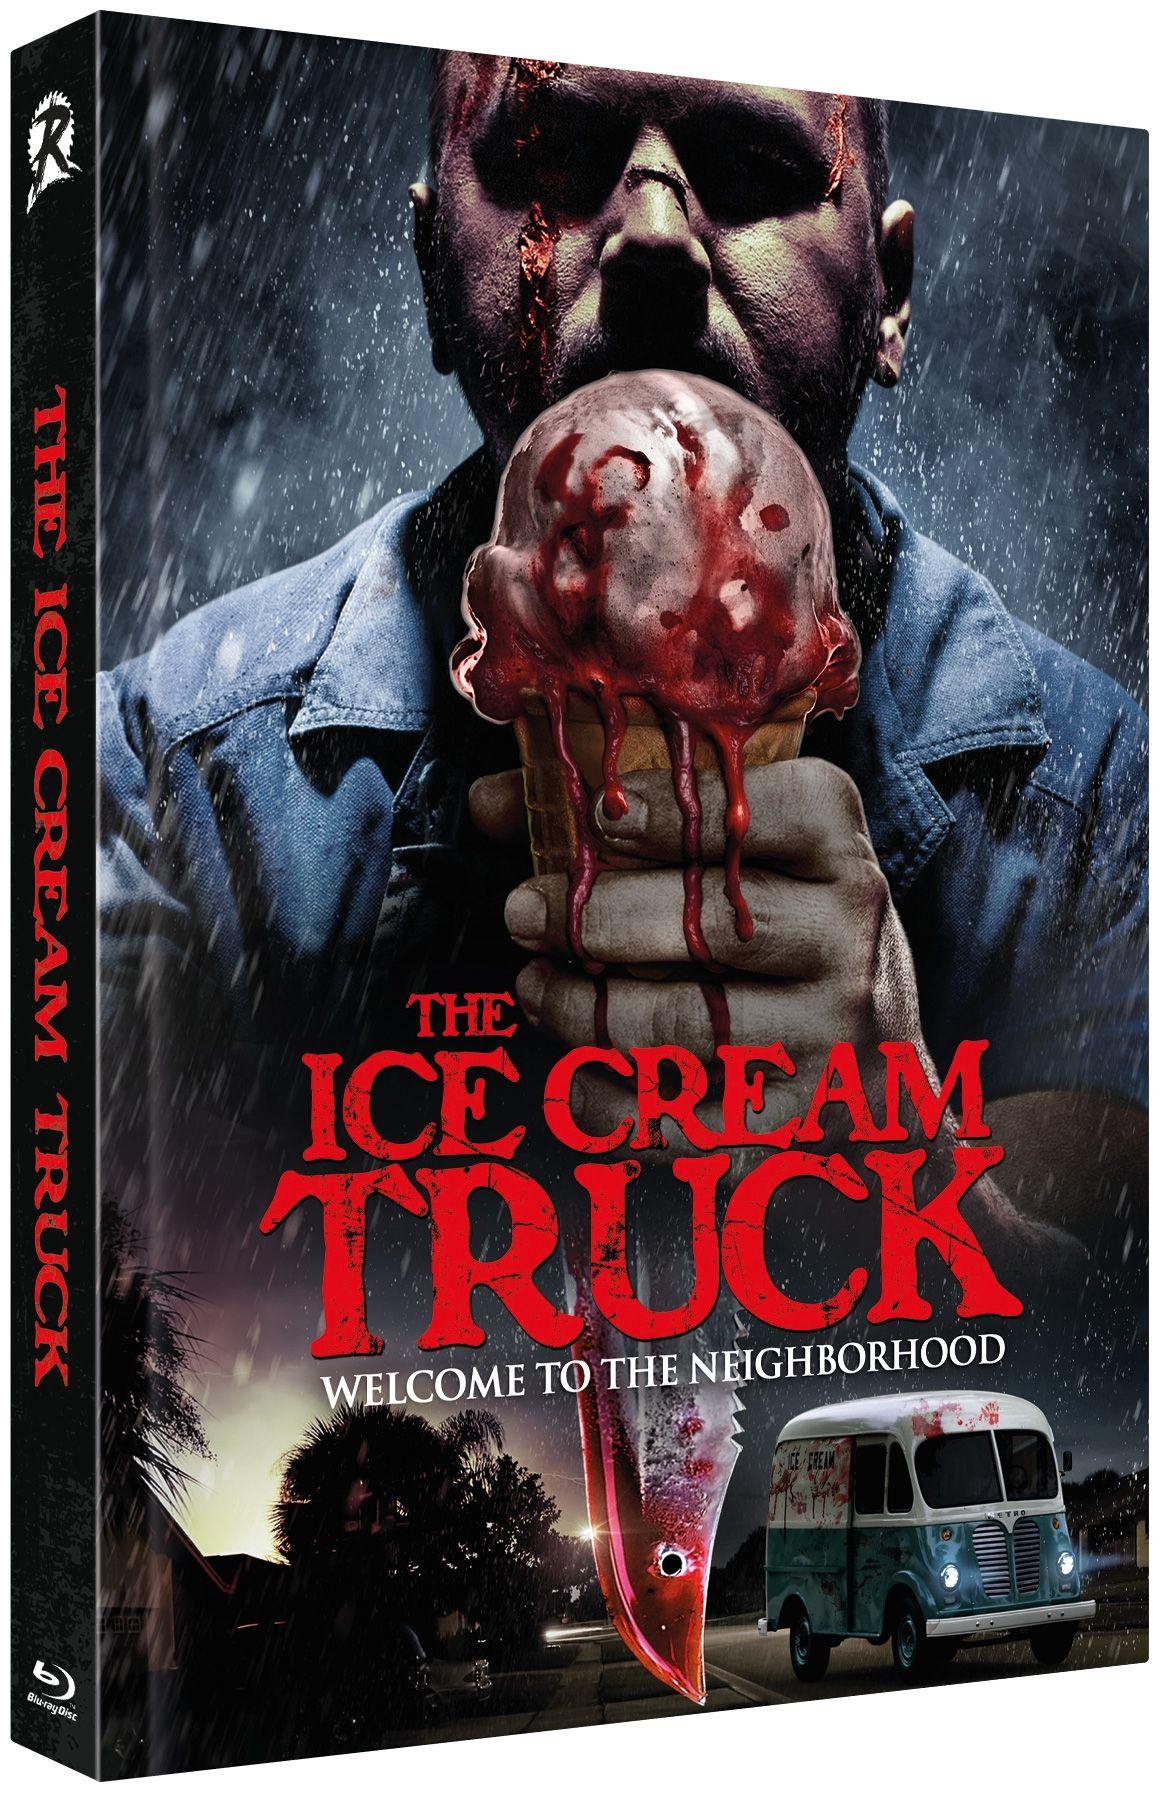 Ice Cream Truck, The (Lim. Uncut Mediabook - Cover C) (DVD + BLURAY)